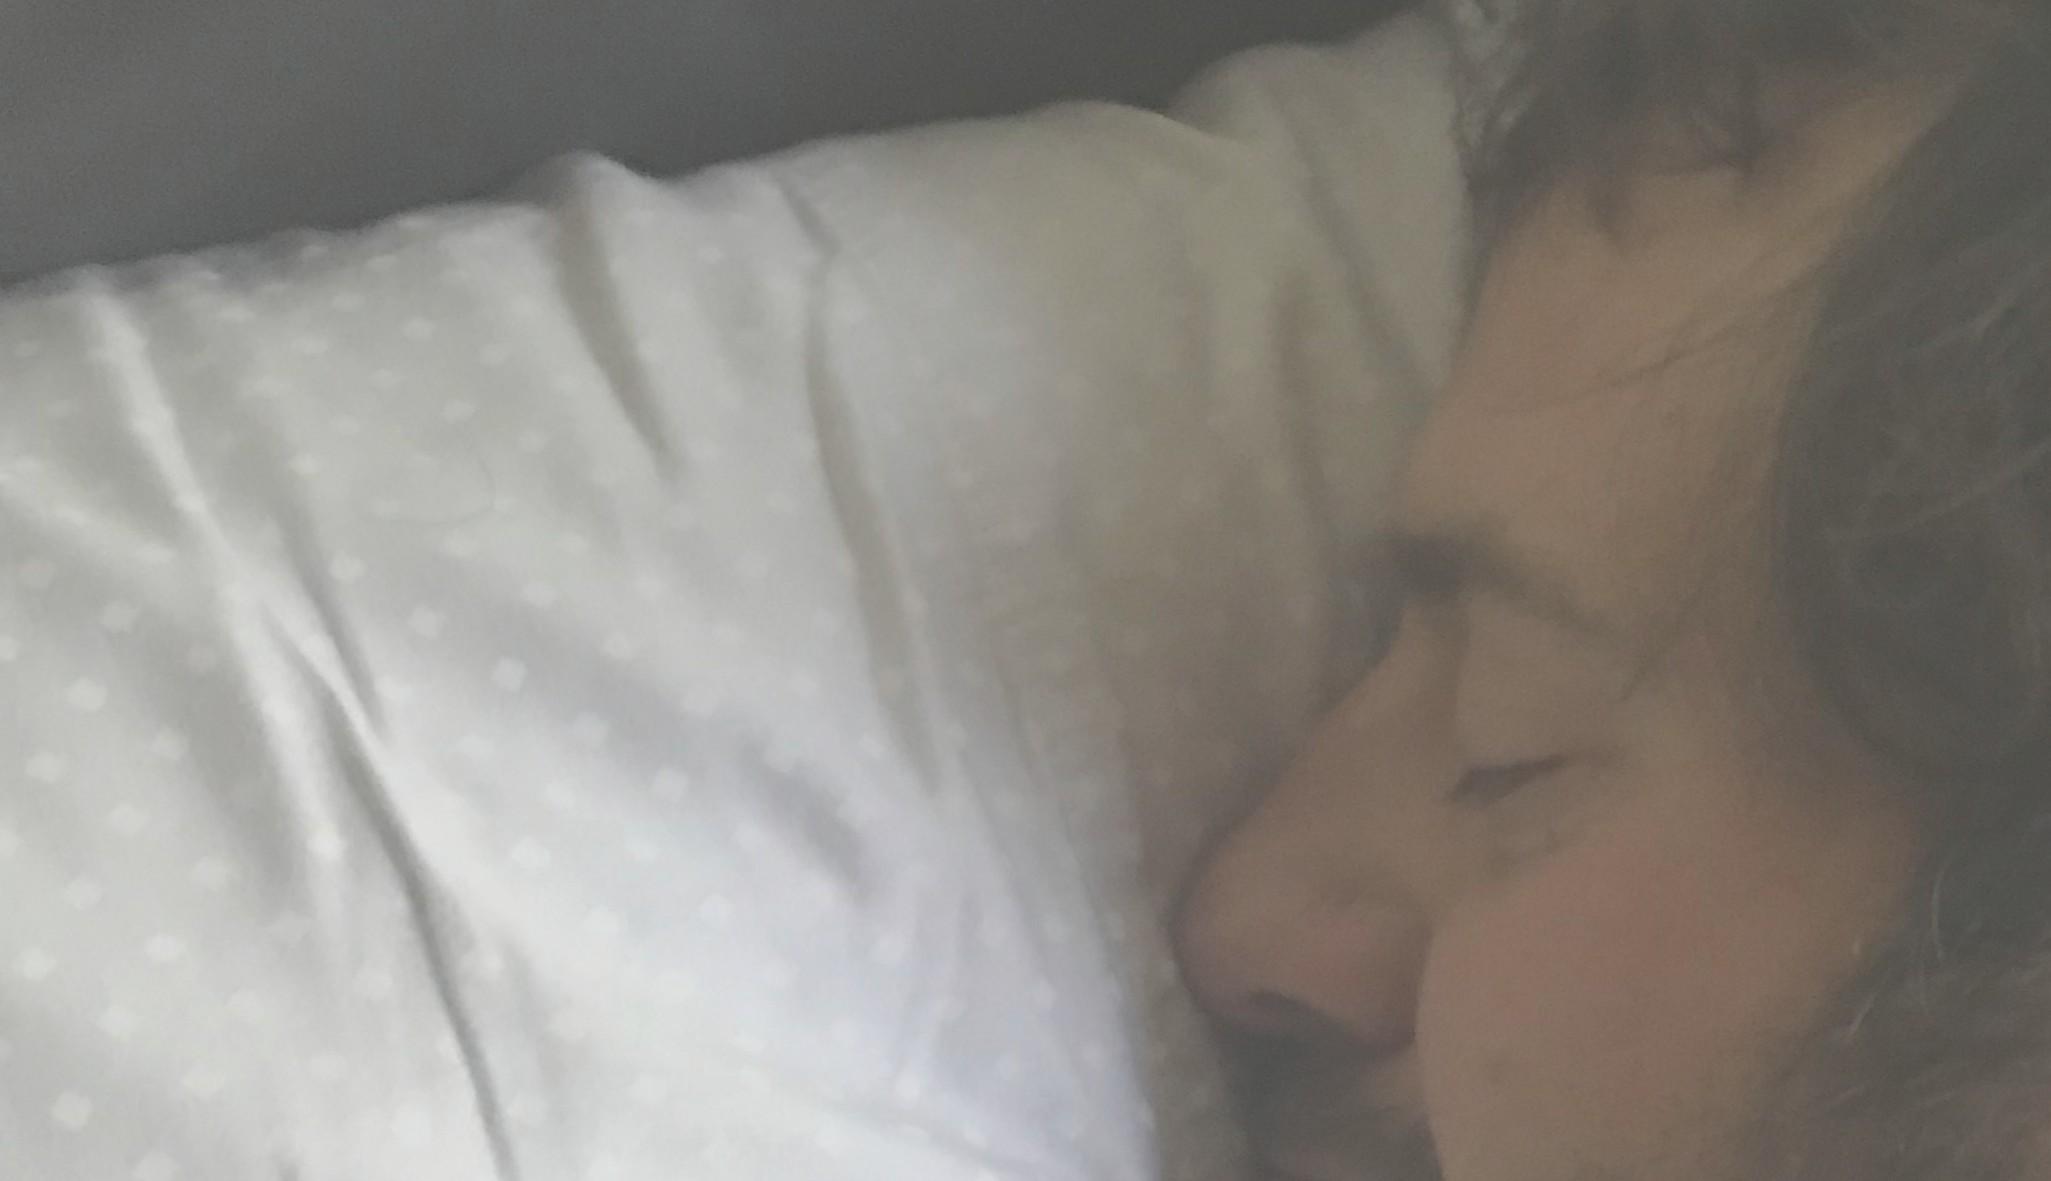 Sleep Help - https://www.sleephelp.org/mental-health-sleep/